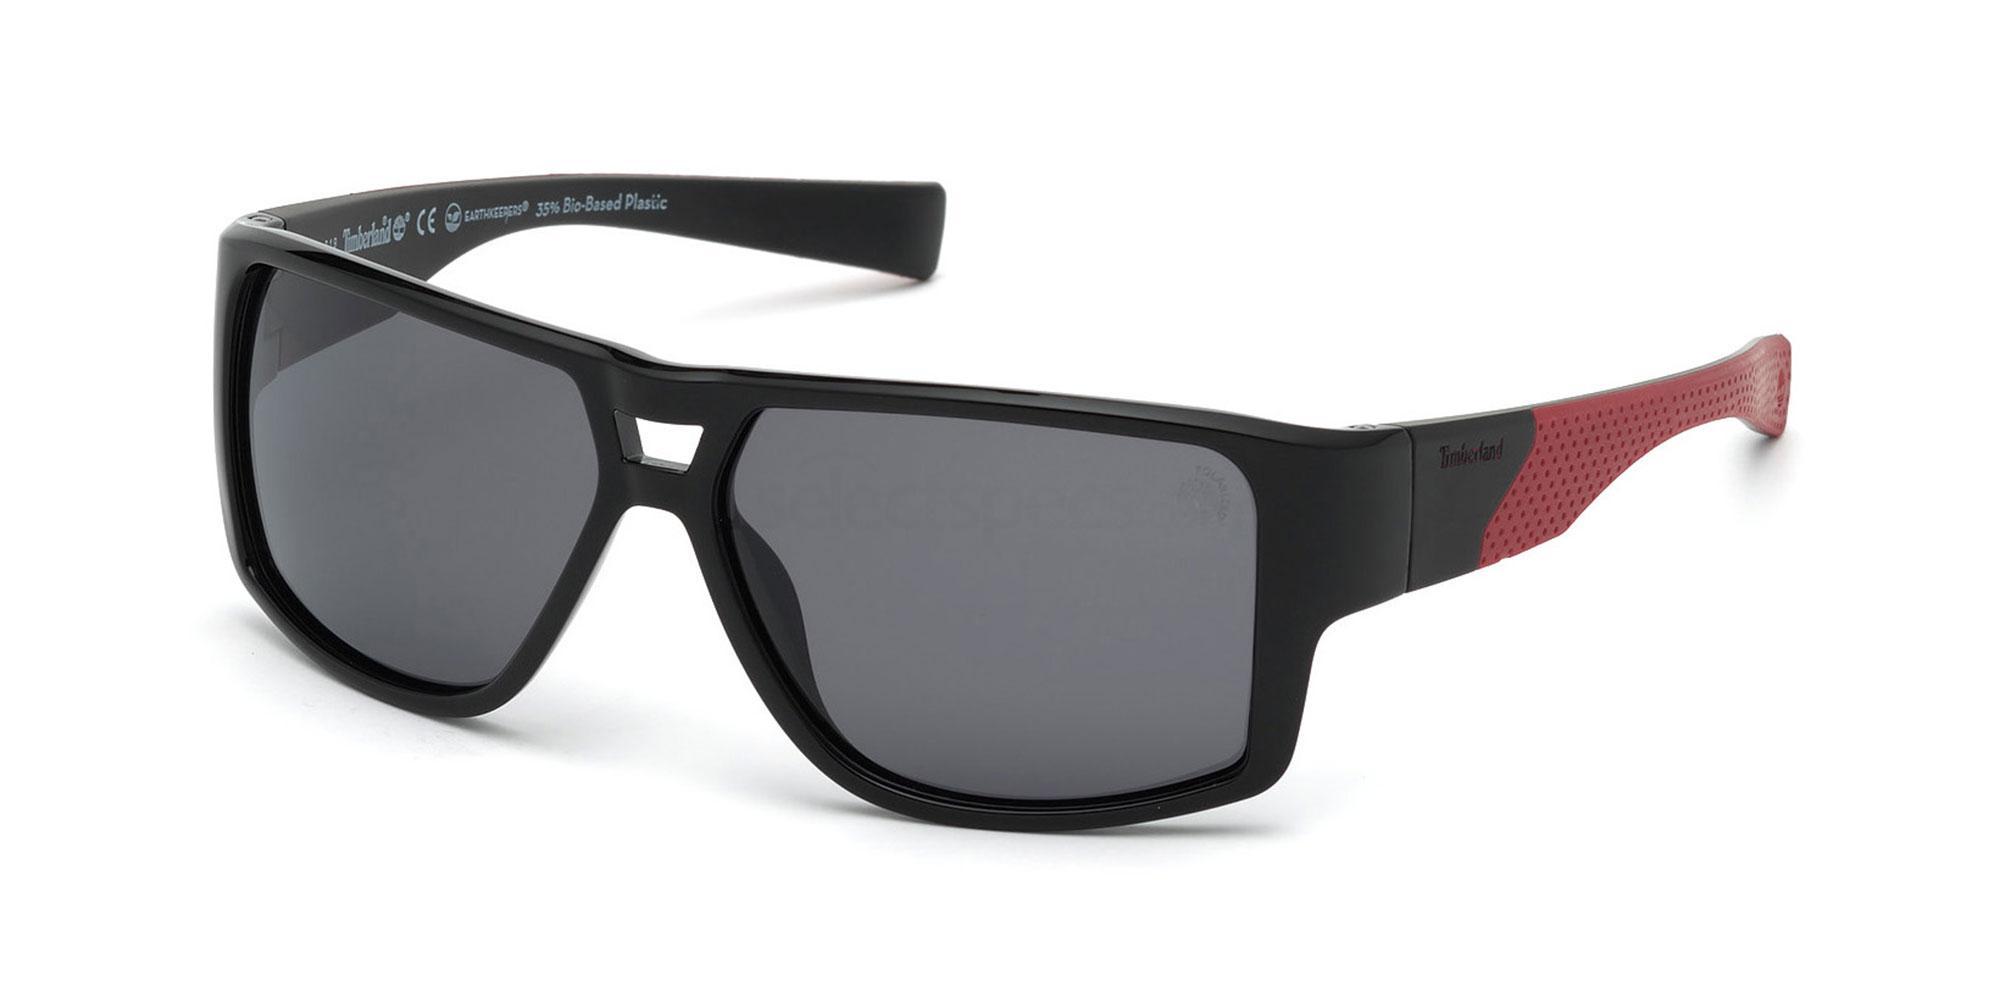 01D TB9204 Sunglasses, Timberland